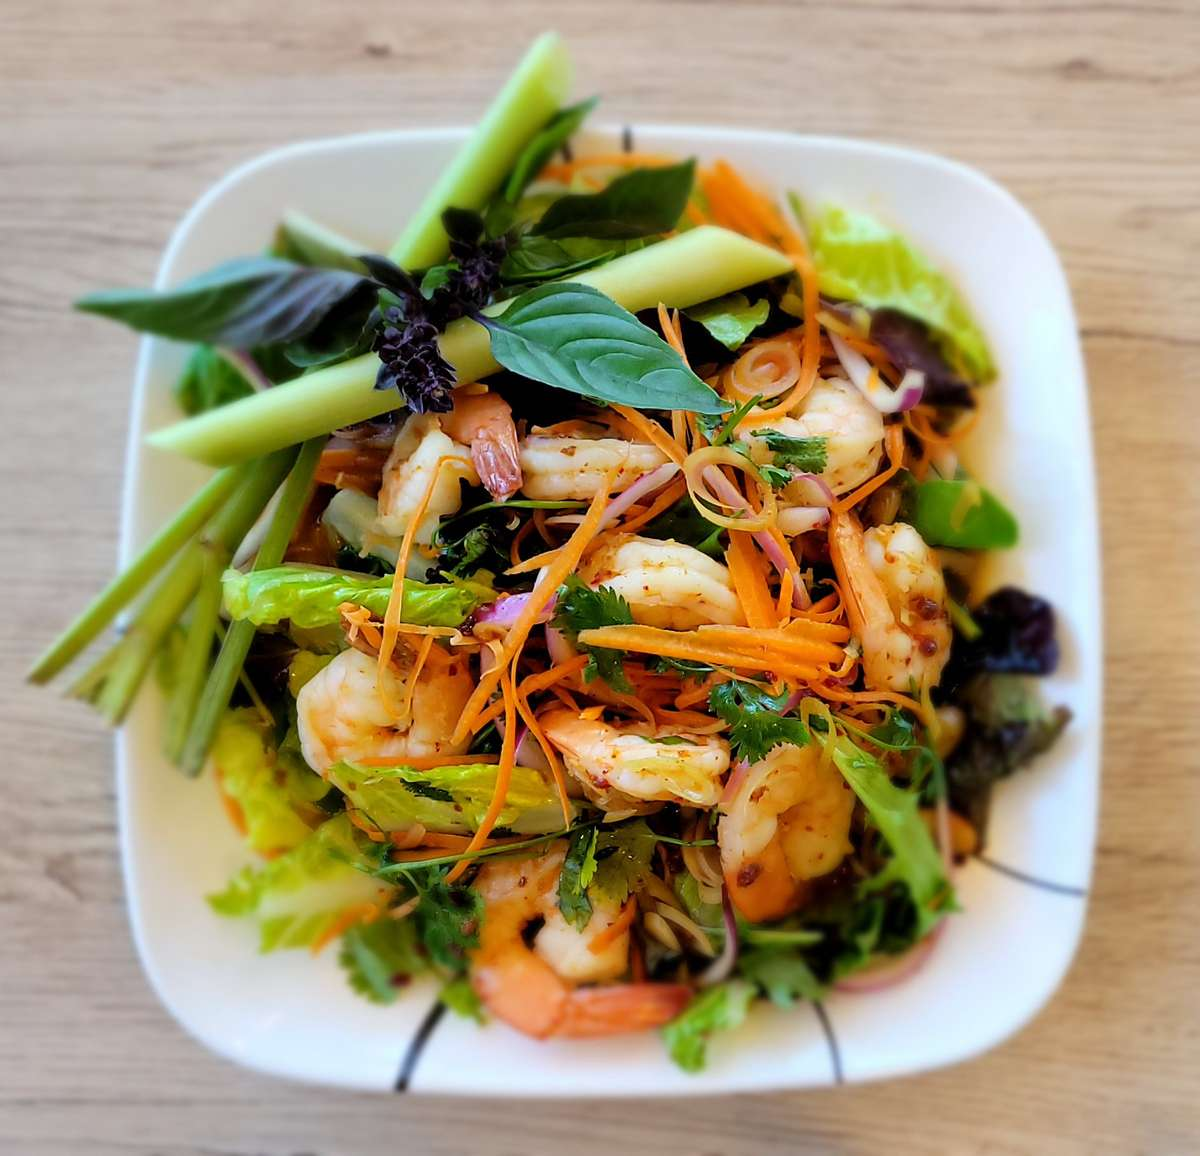 #9 Spicy Shrimp Salad